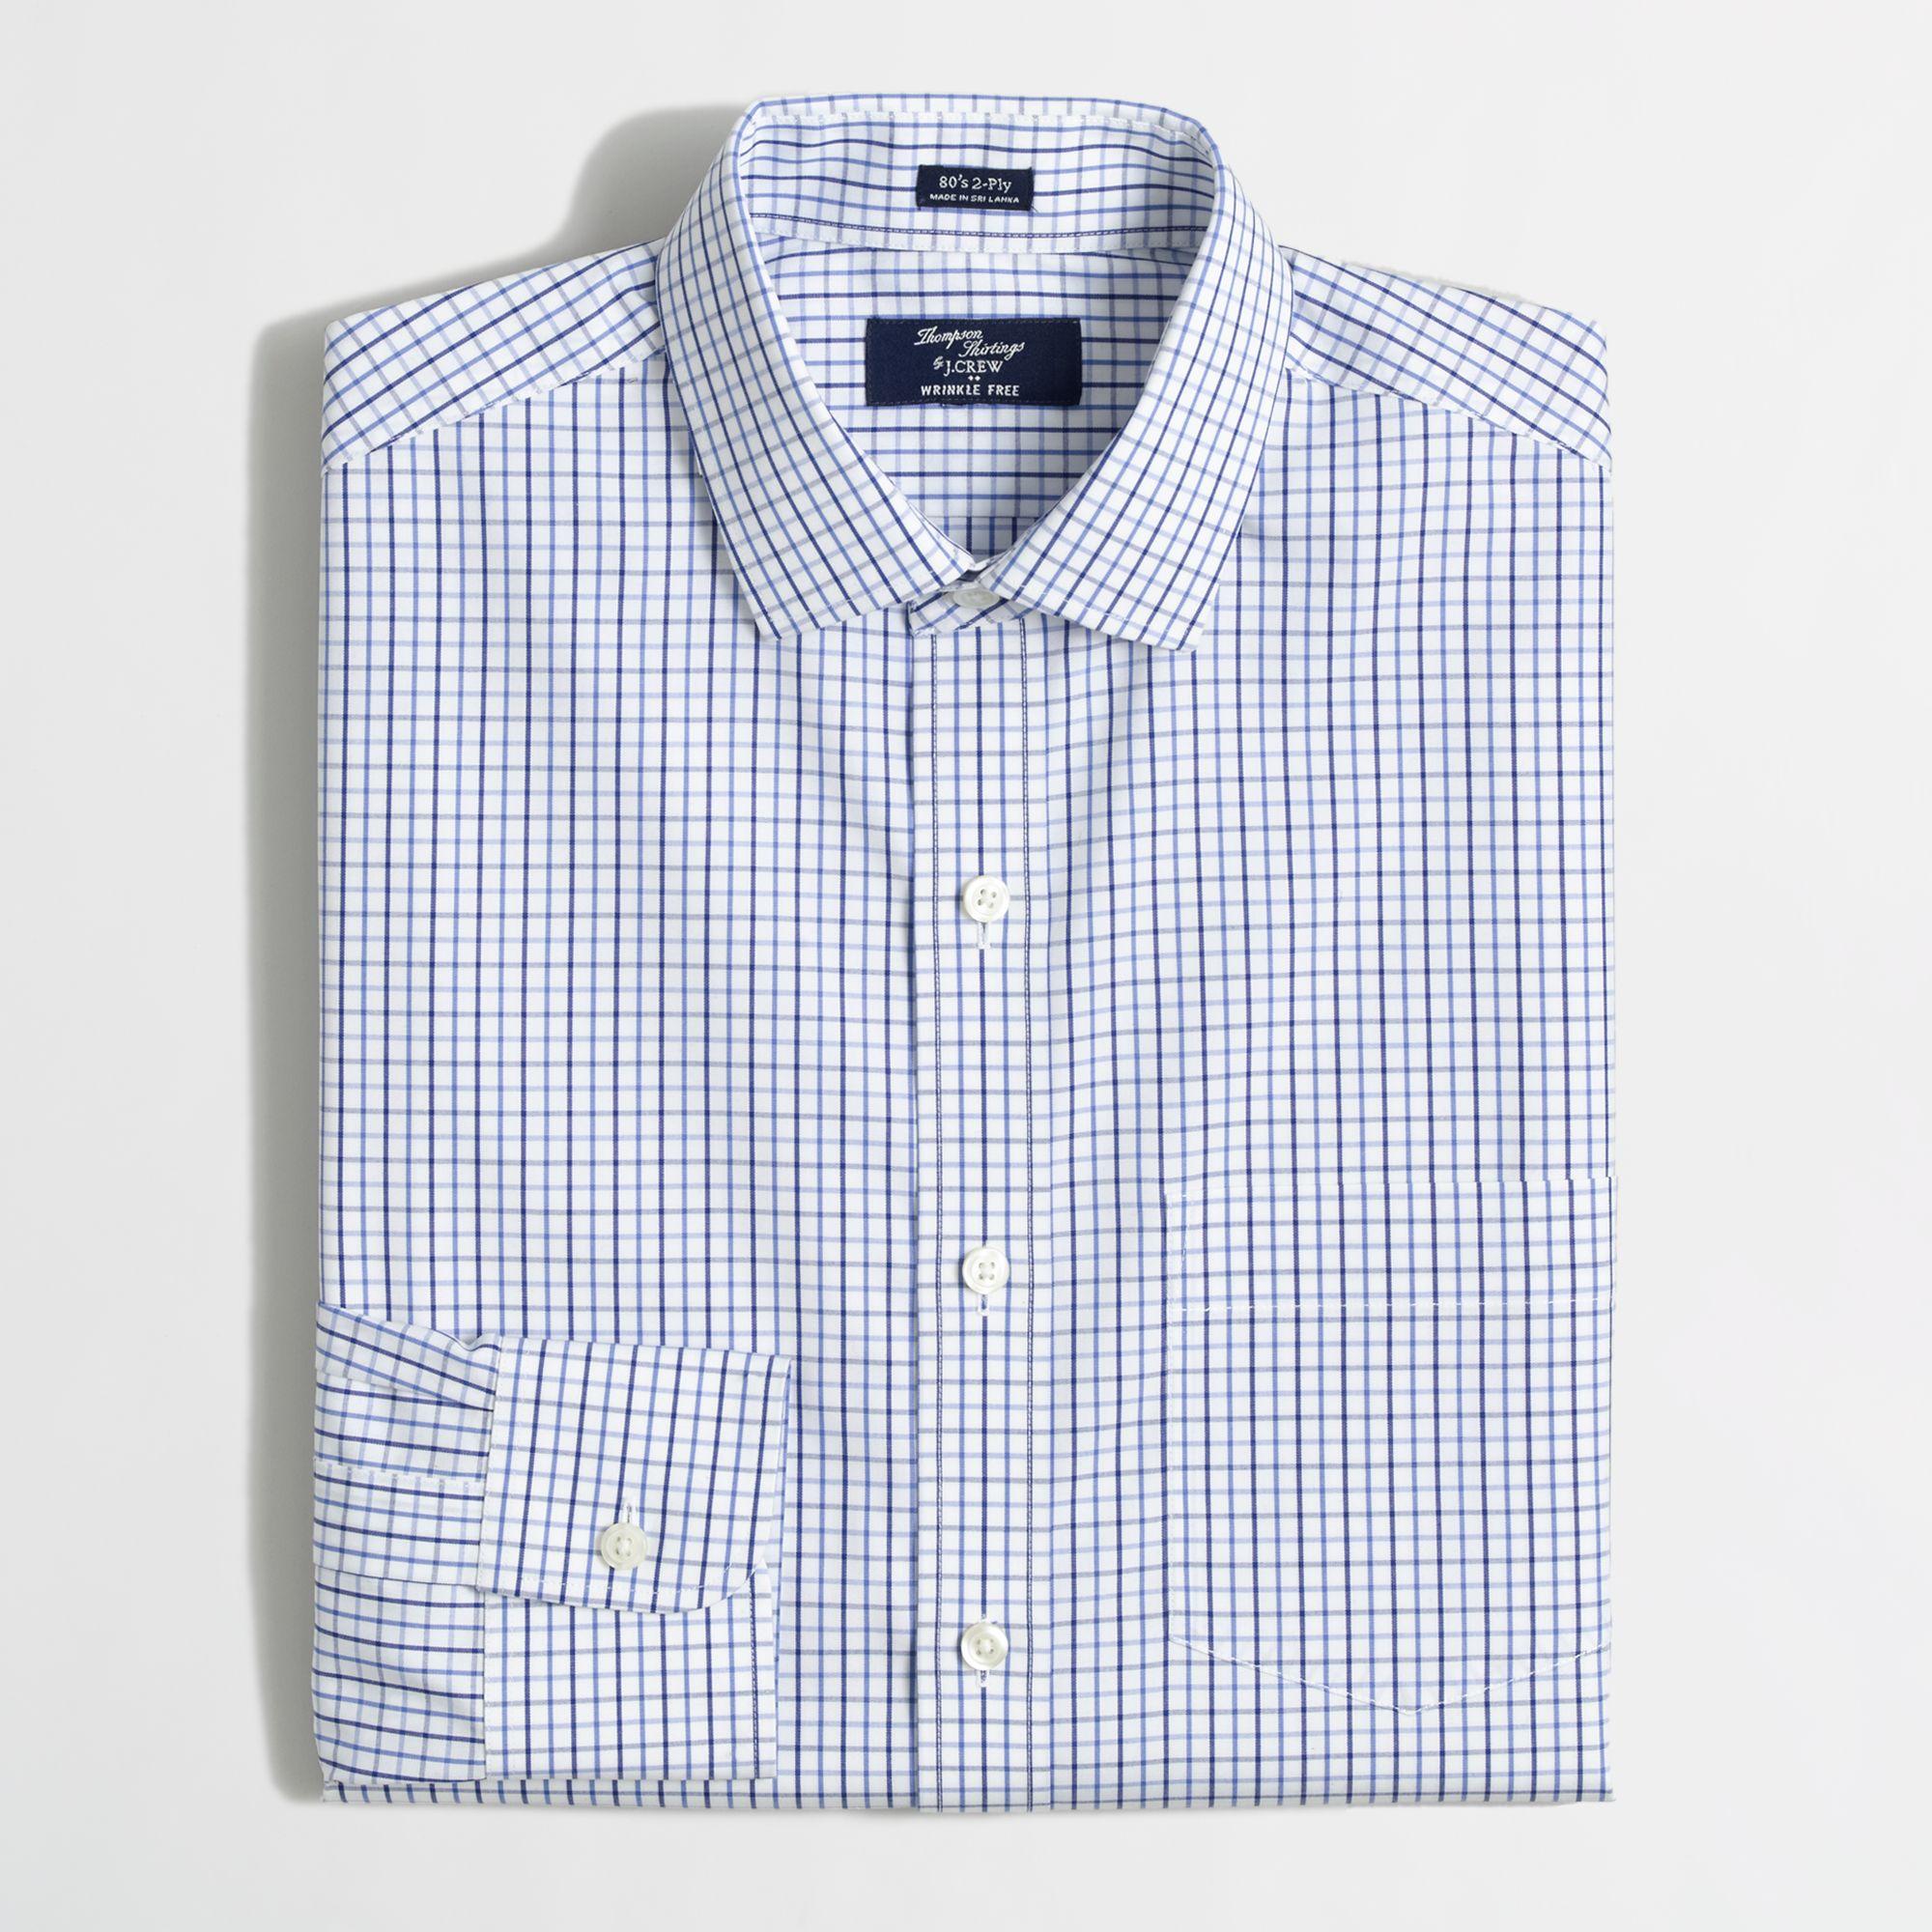 Factory slim thompson wrinklefree spreadcollar for Small collar dress shirt